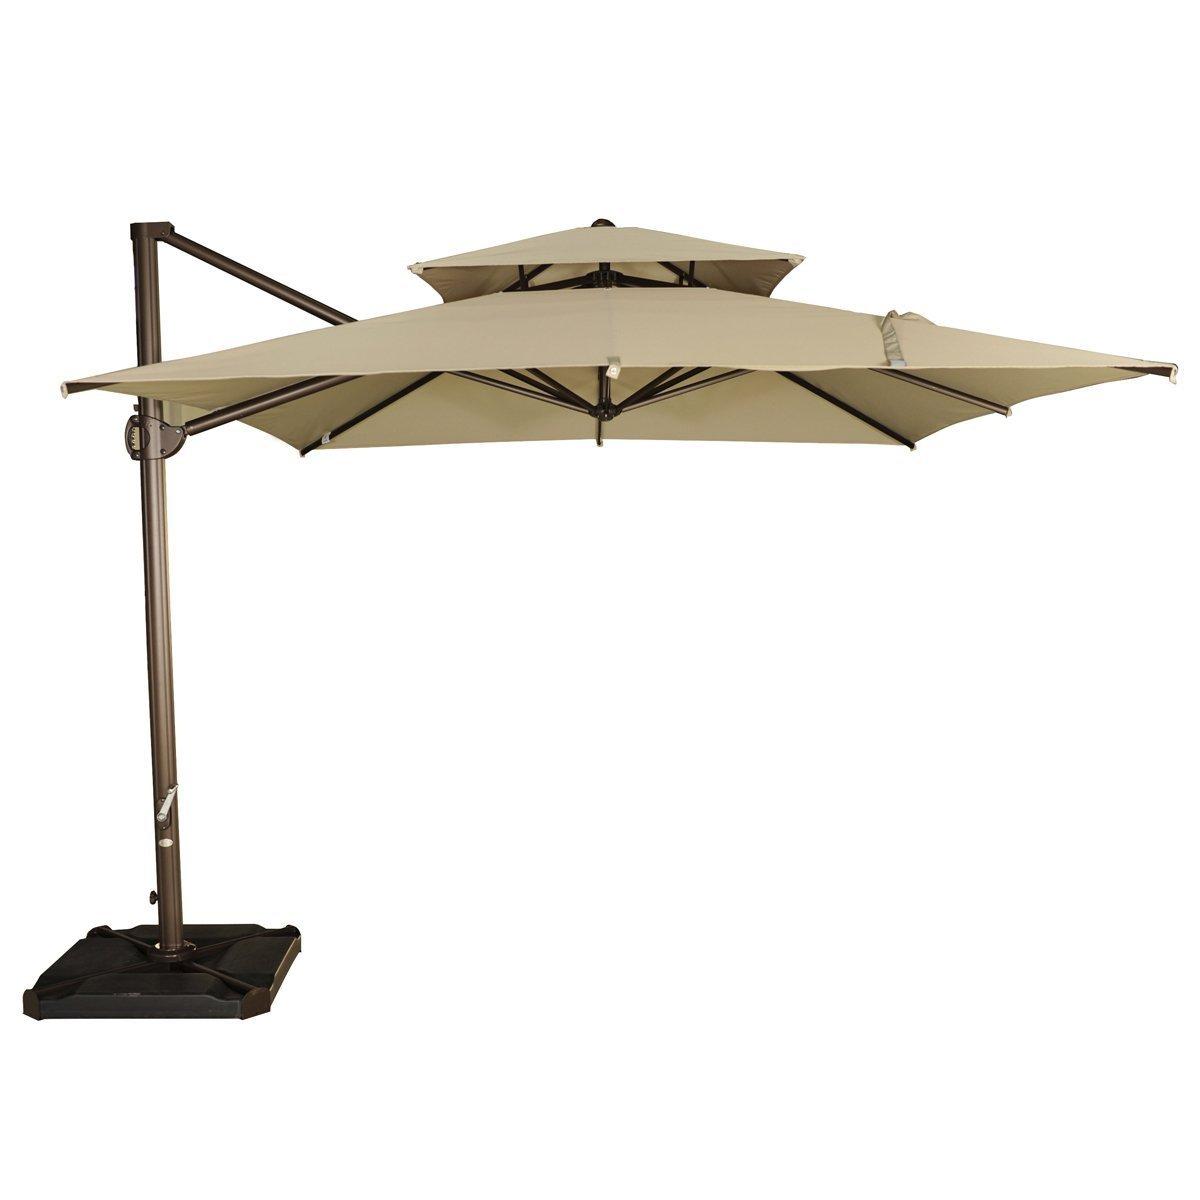 9 Ft Square Offset Cantilever Patio Hanging Umbrella W